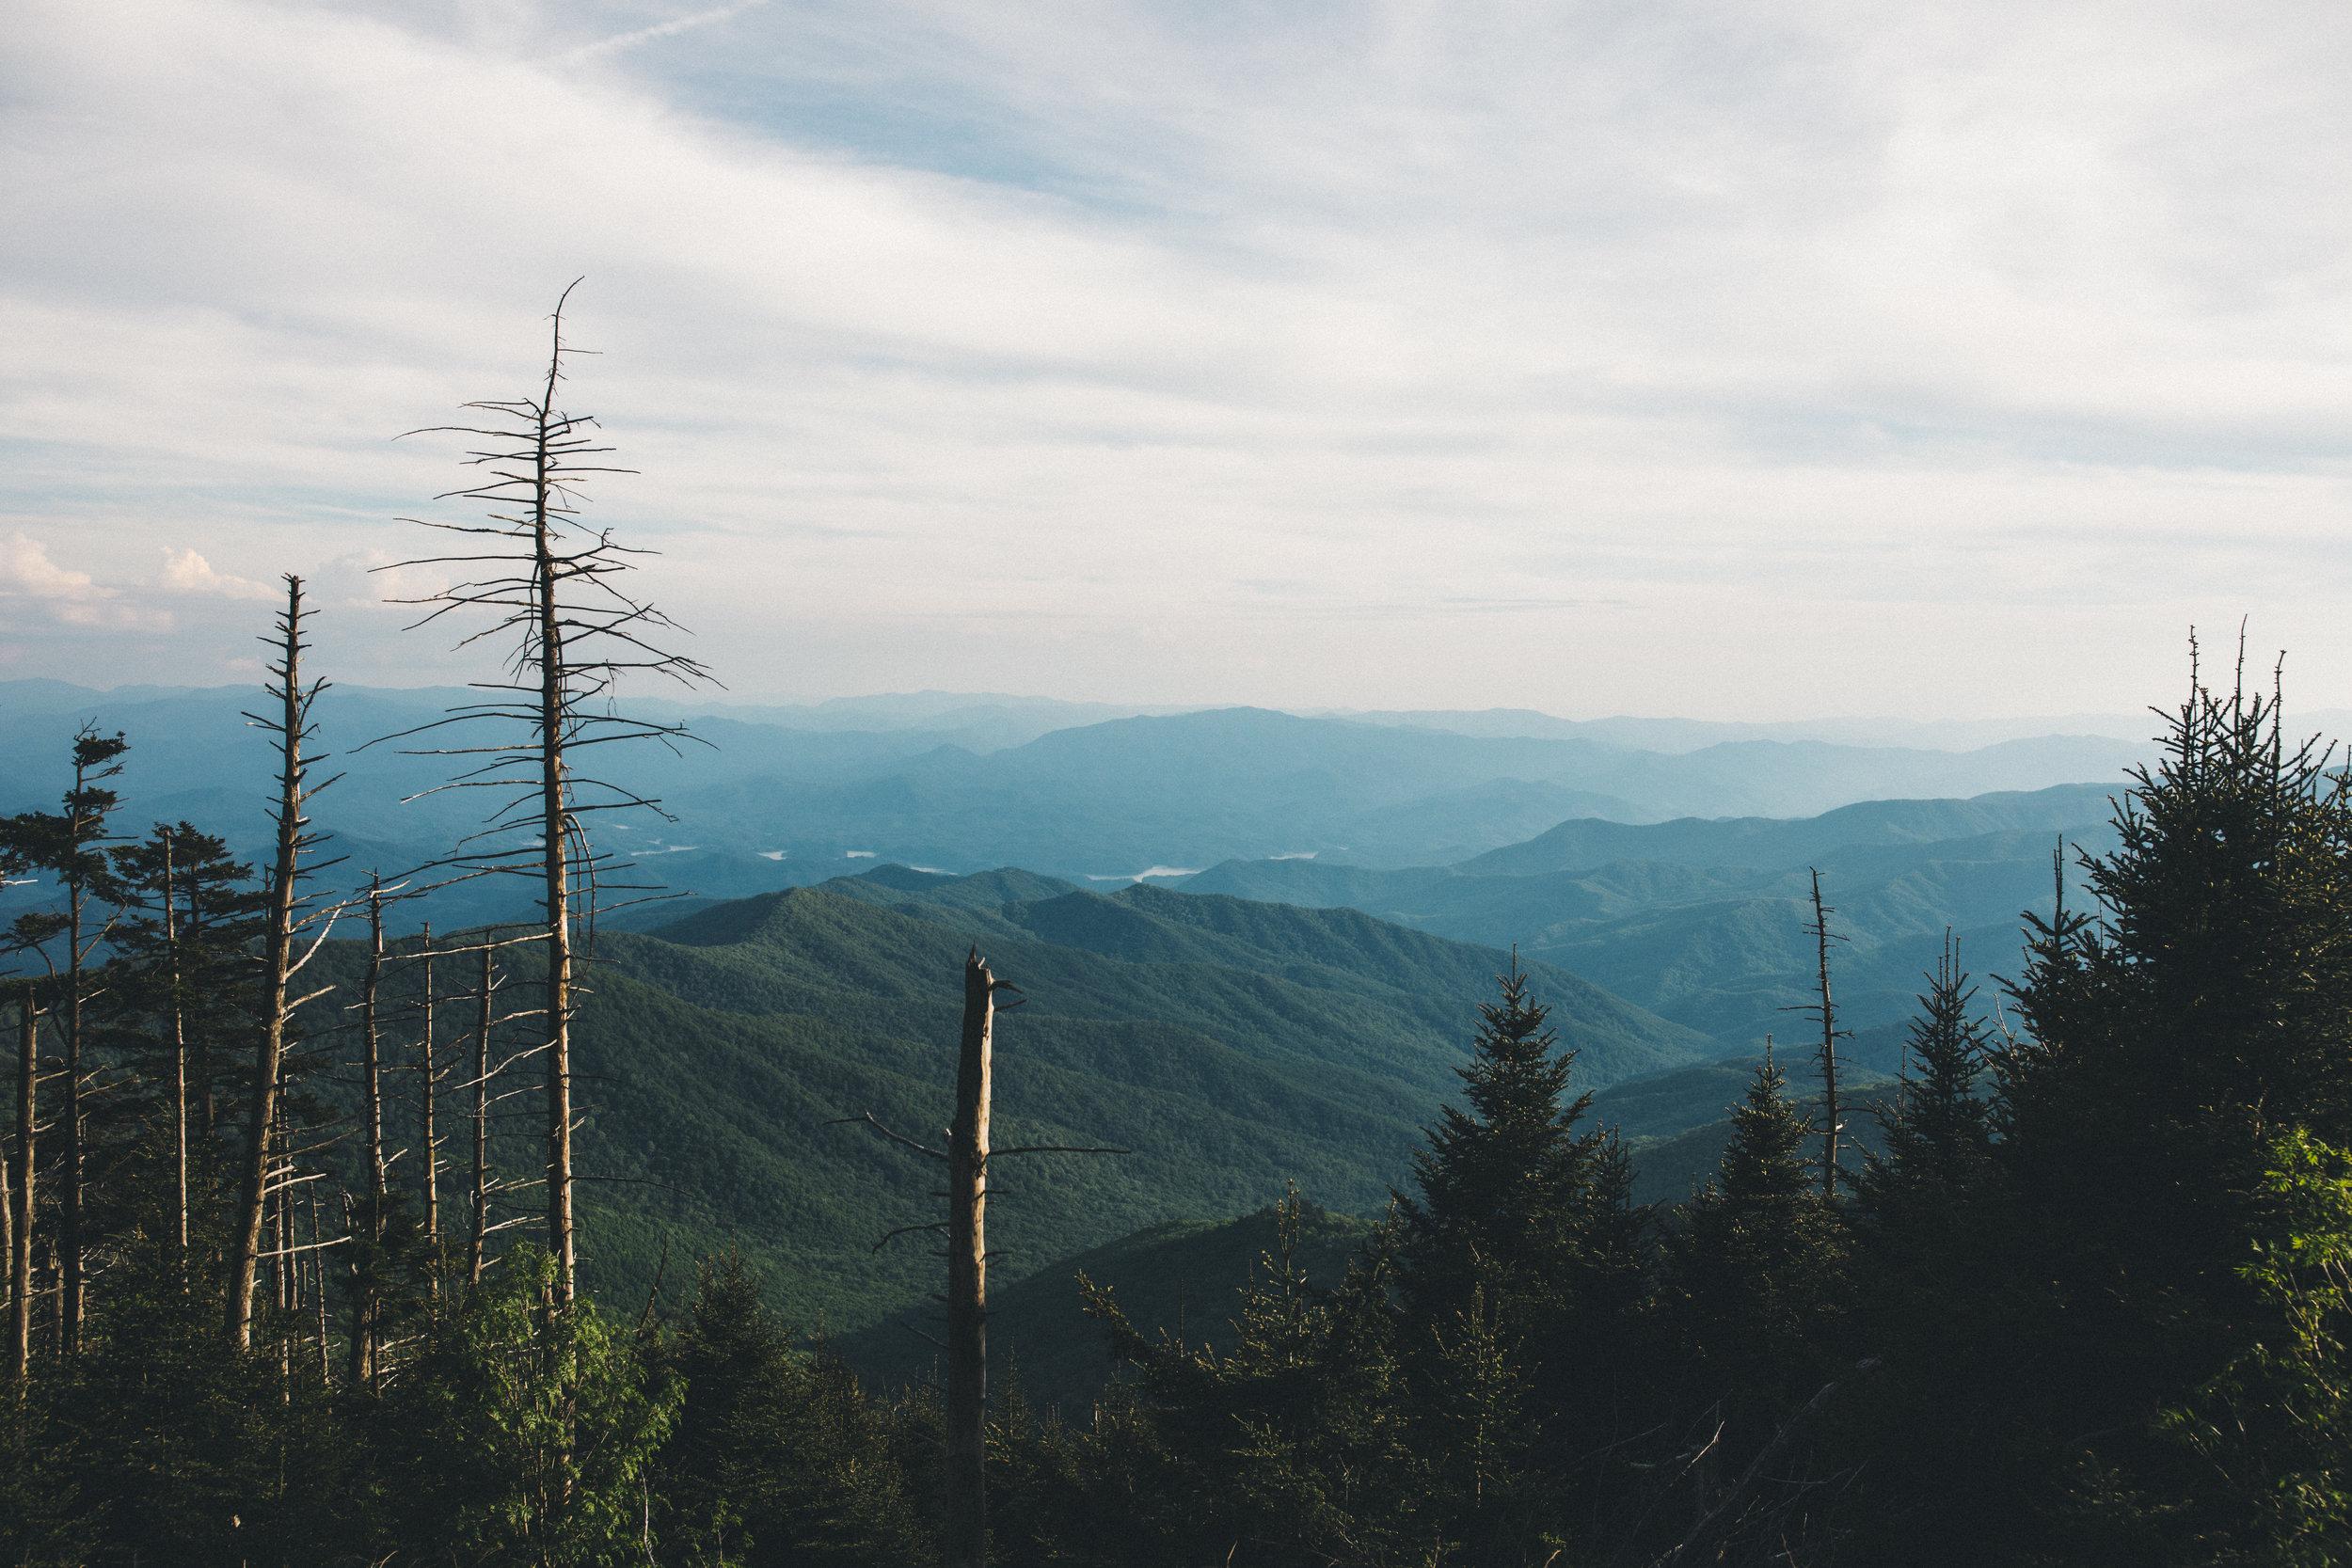 Episode 1: My Appalachian Trail Thru Hike -